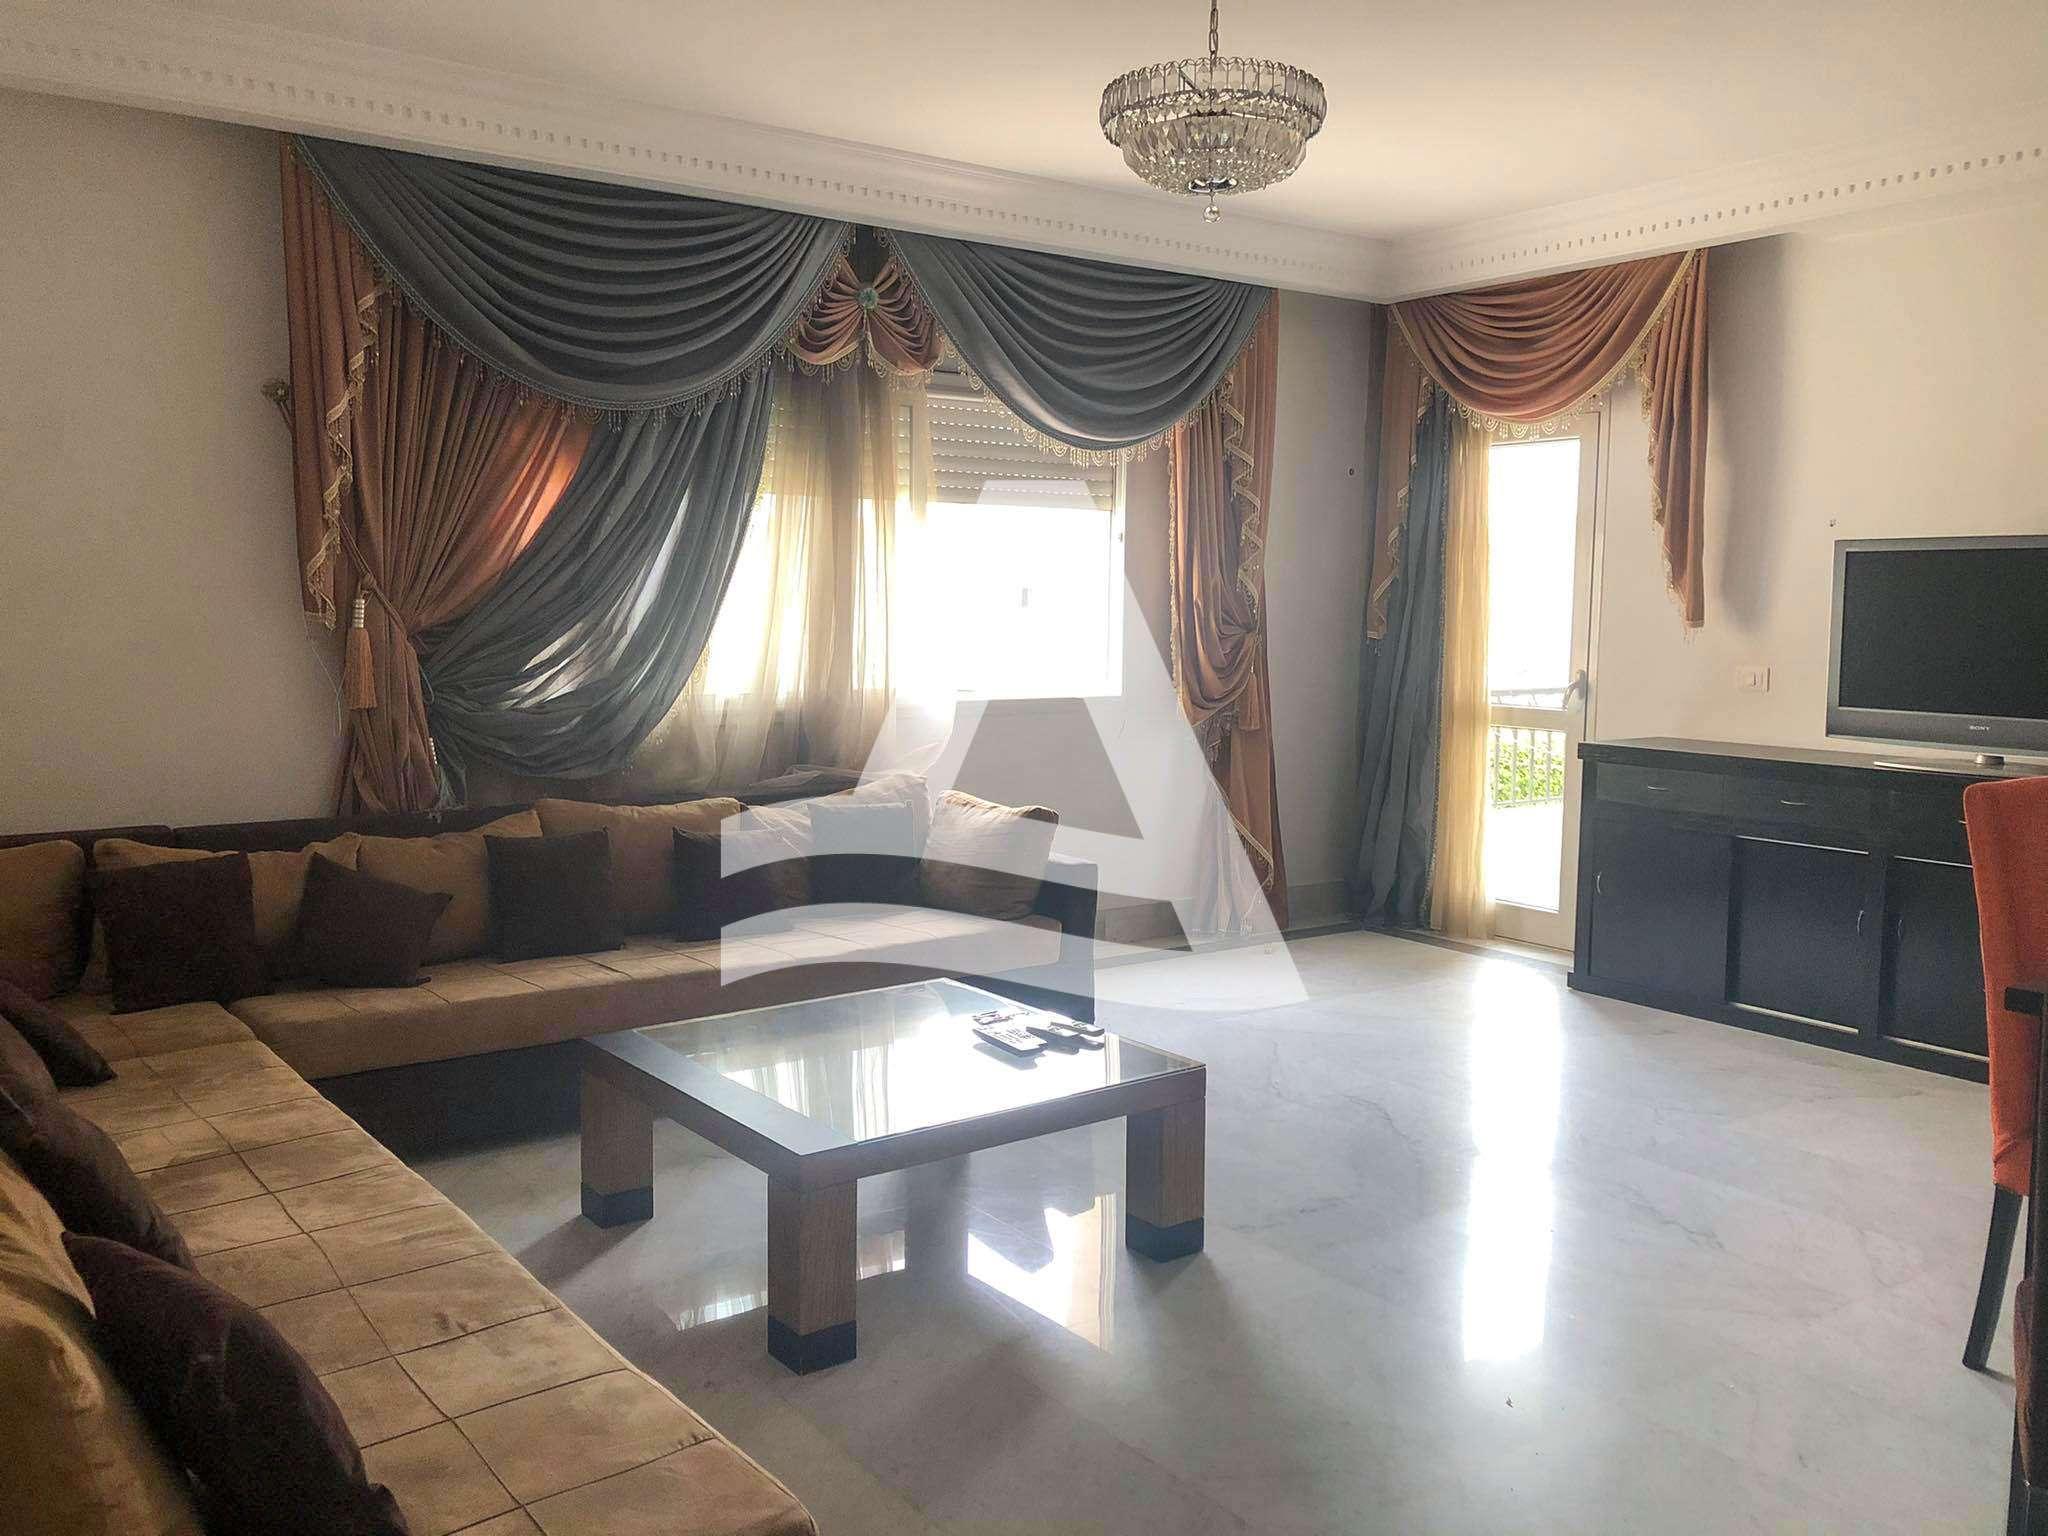 httpss3.amazonaws.comlogimoaws17677137731608282244appartement_jardin_de_carthage_15_sur_16